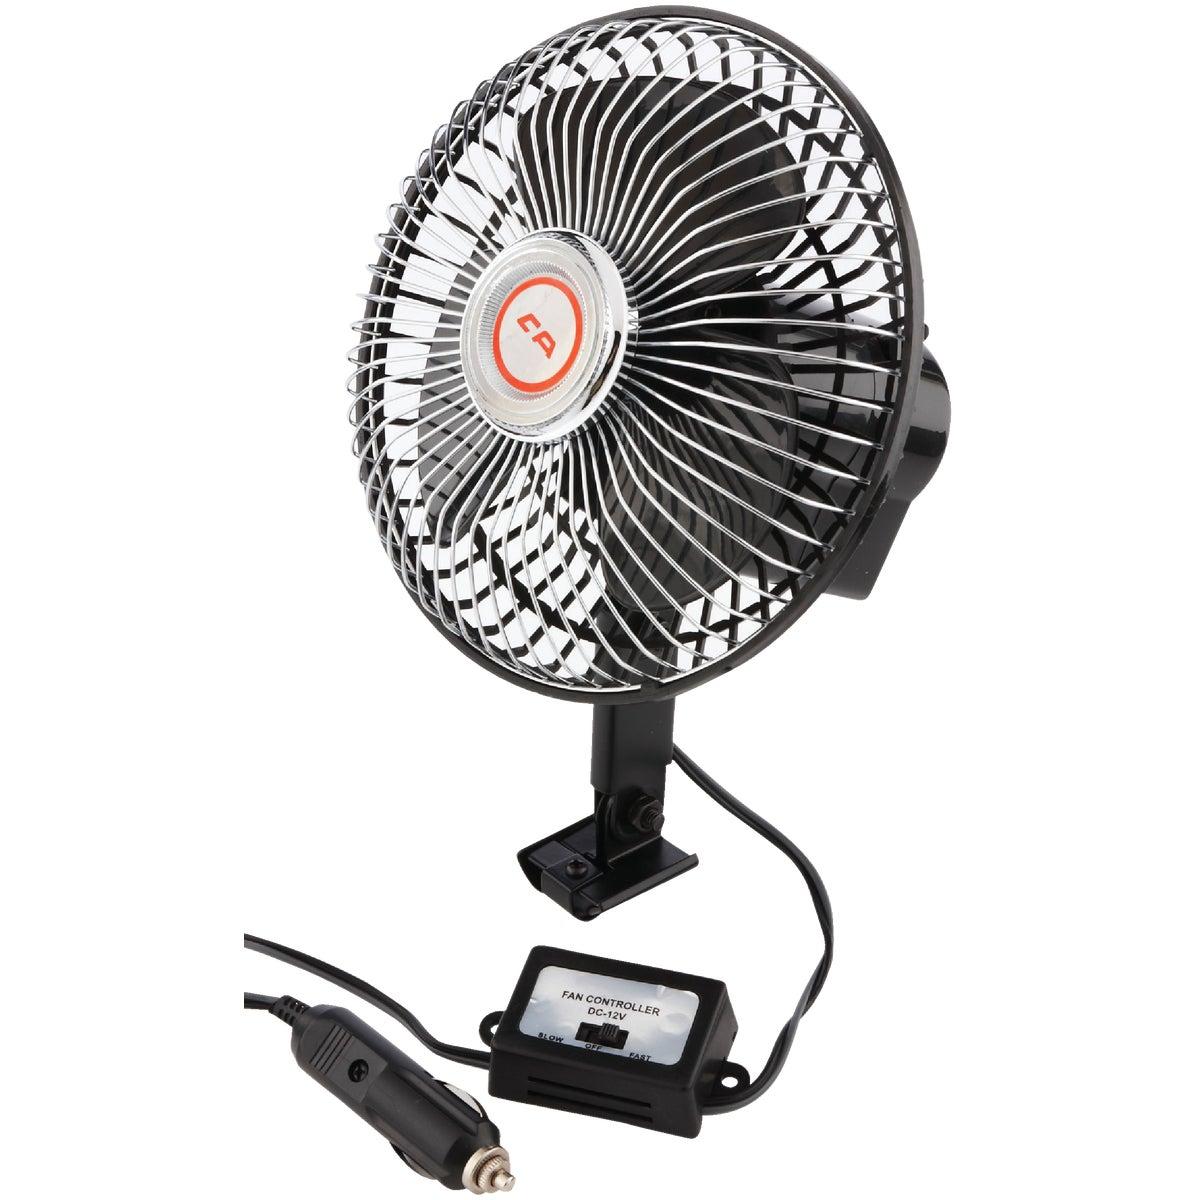 Oscillating Auto Fan